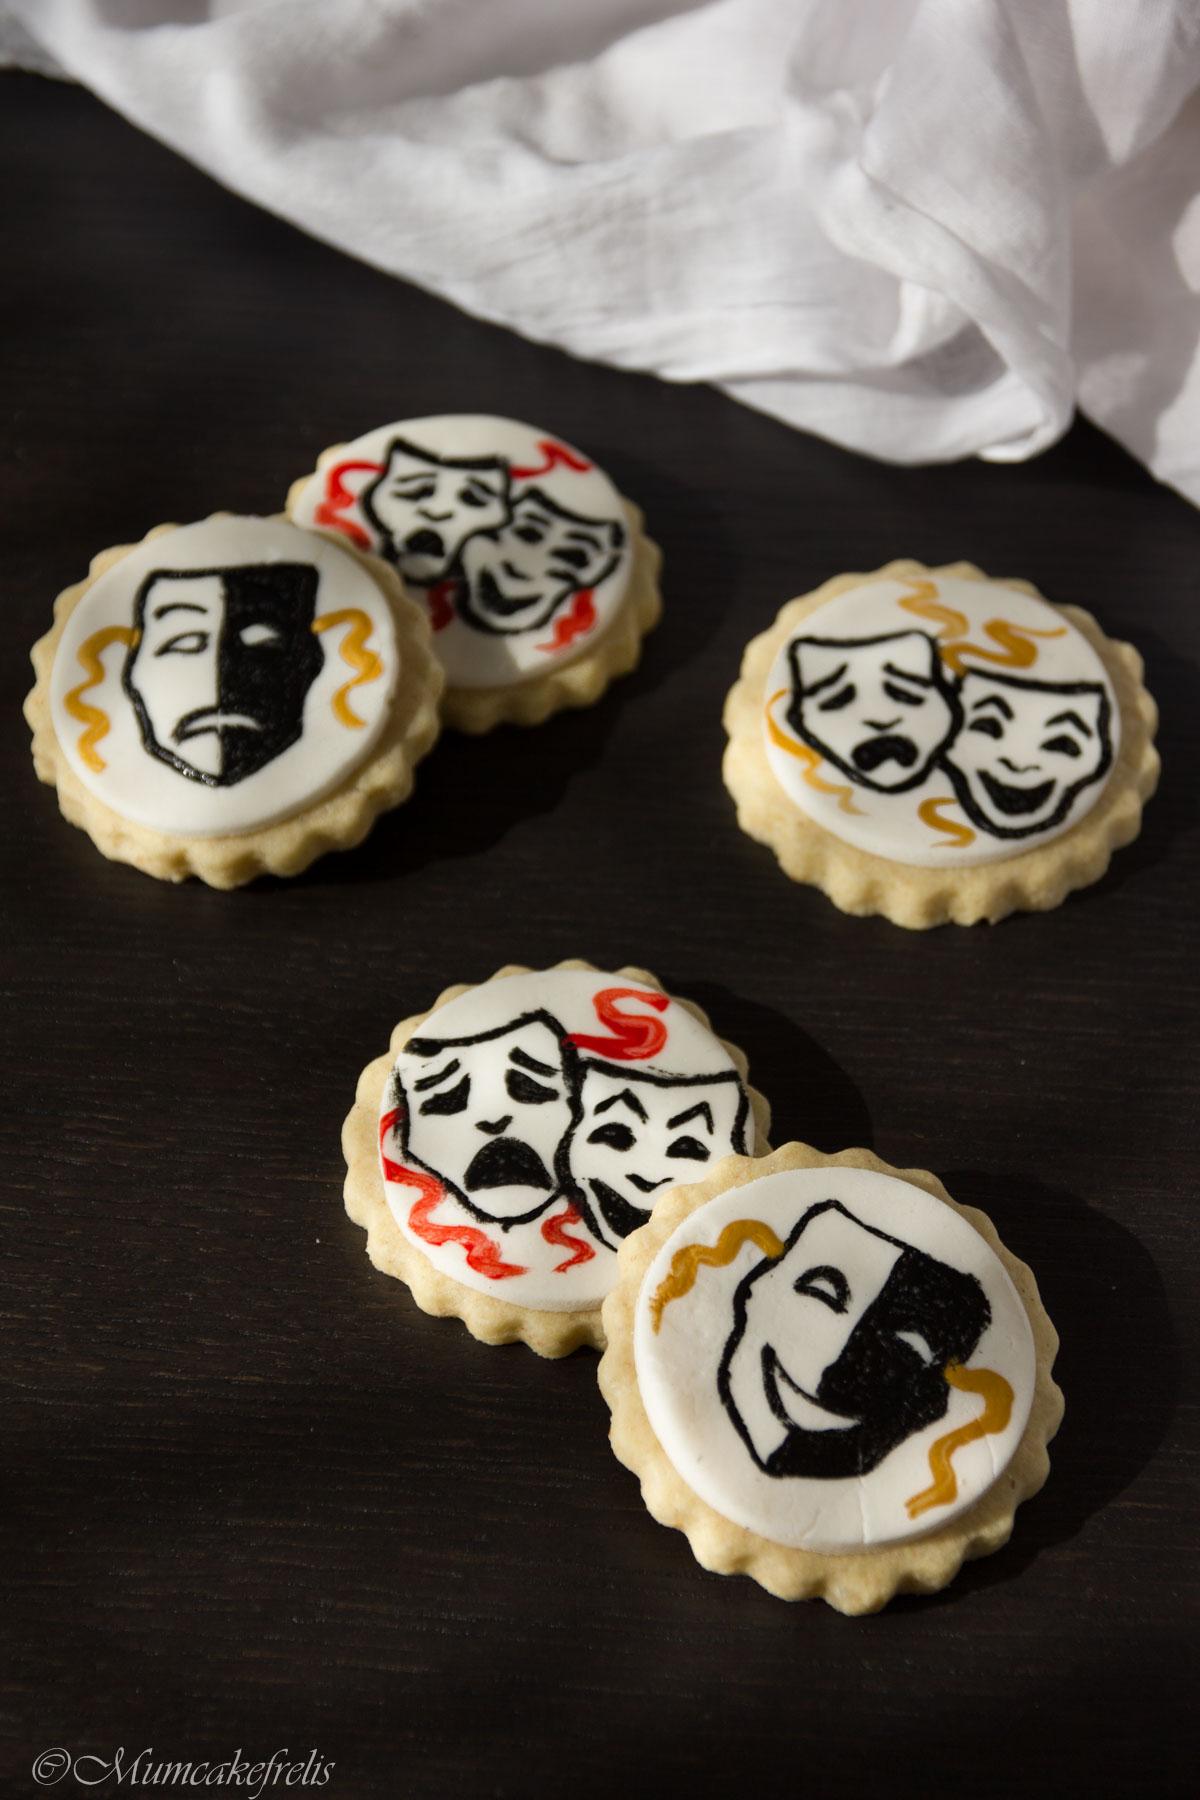 biscotti dipinti a mano su pasta di zucchero